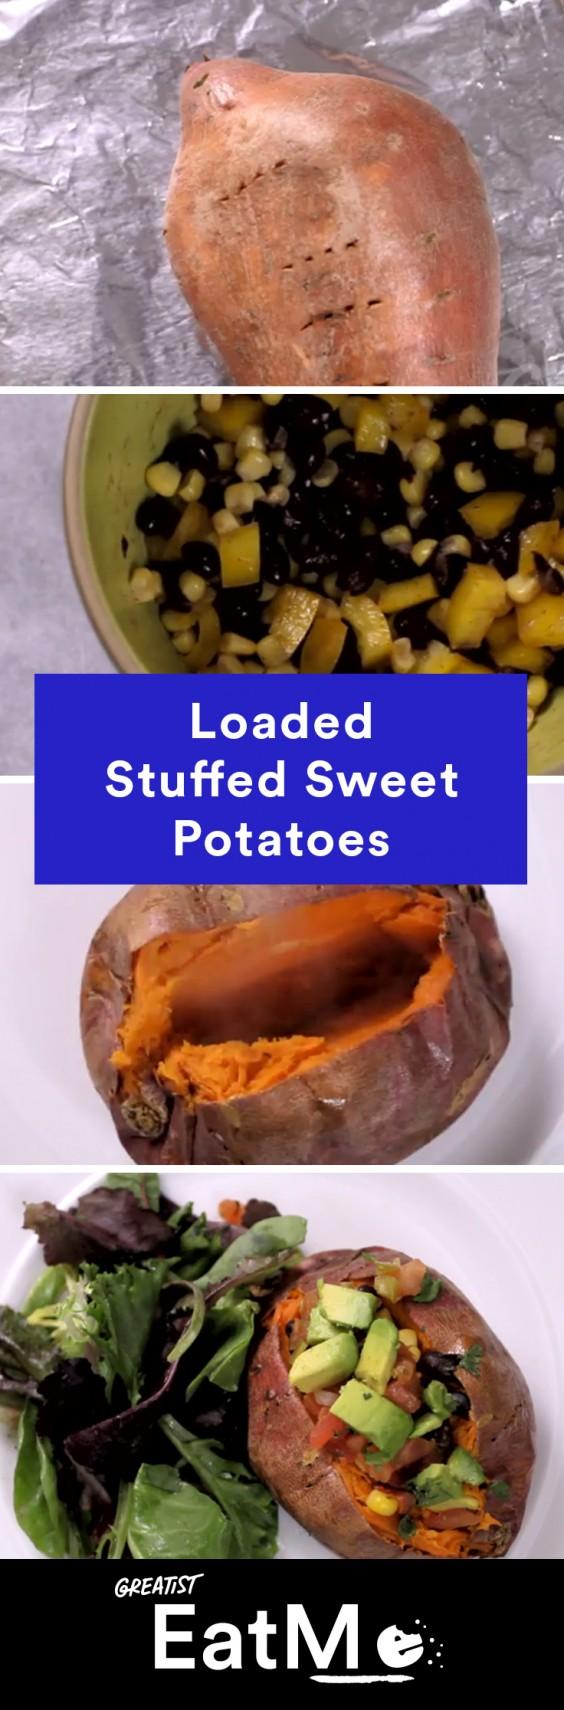 Eat Me Video: Stuffed Sweet Potatoes